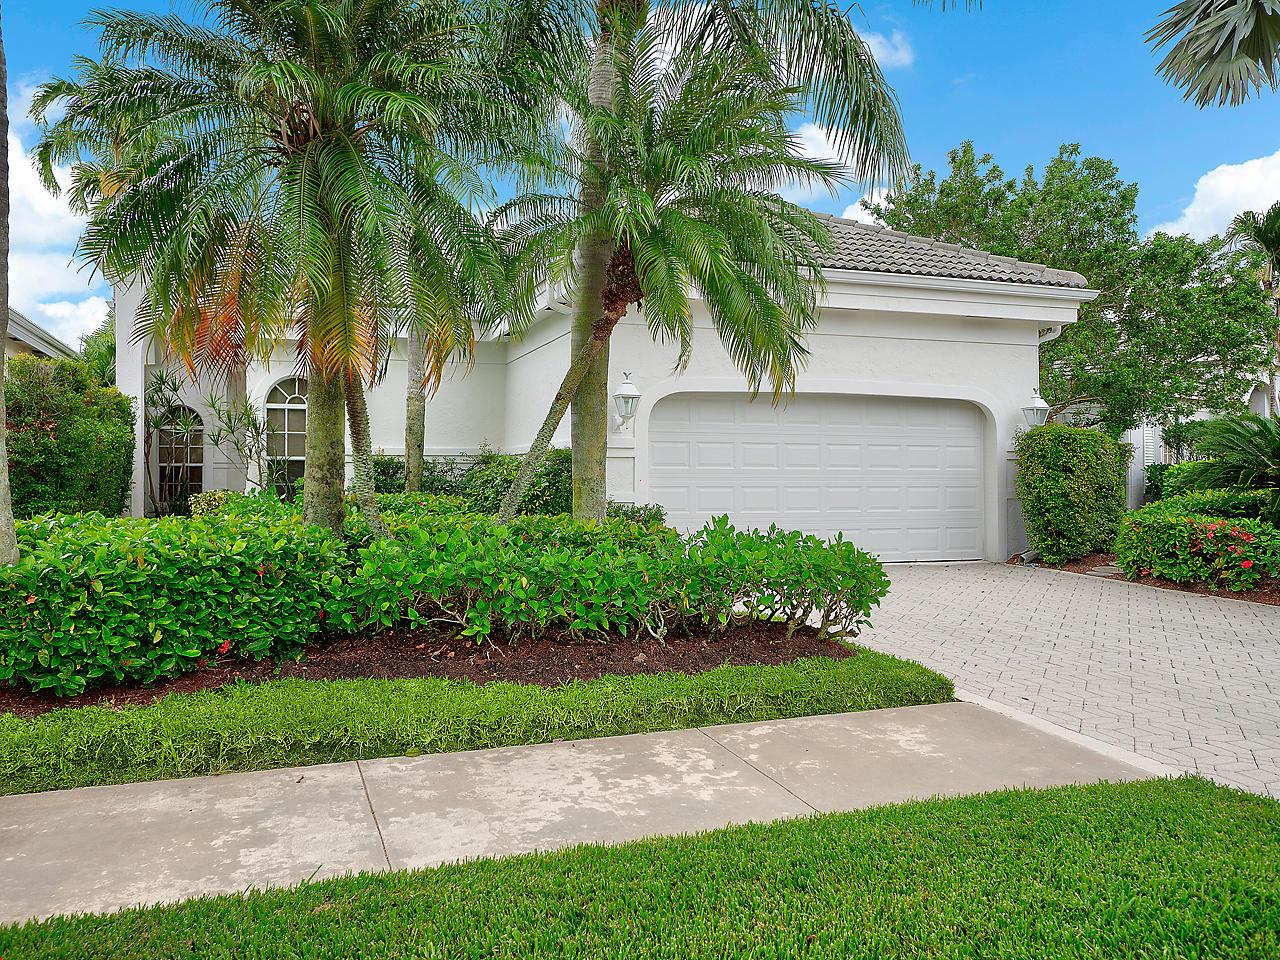 114 Emerald Key Lane, Palm Beach Gardens, Florida 33418, 3 Bedrooms Bedrooms, ,3 BathroomsBathrooms,A,Single family,Emerald Key,RX-10577147